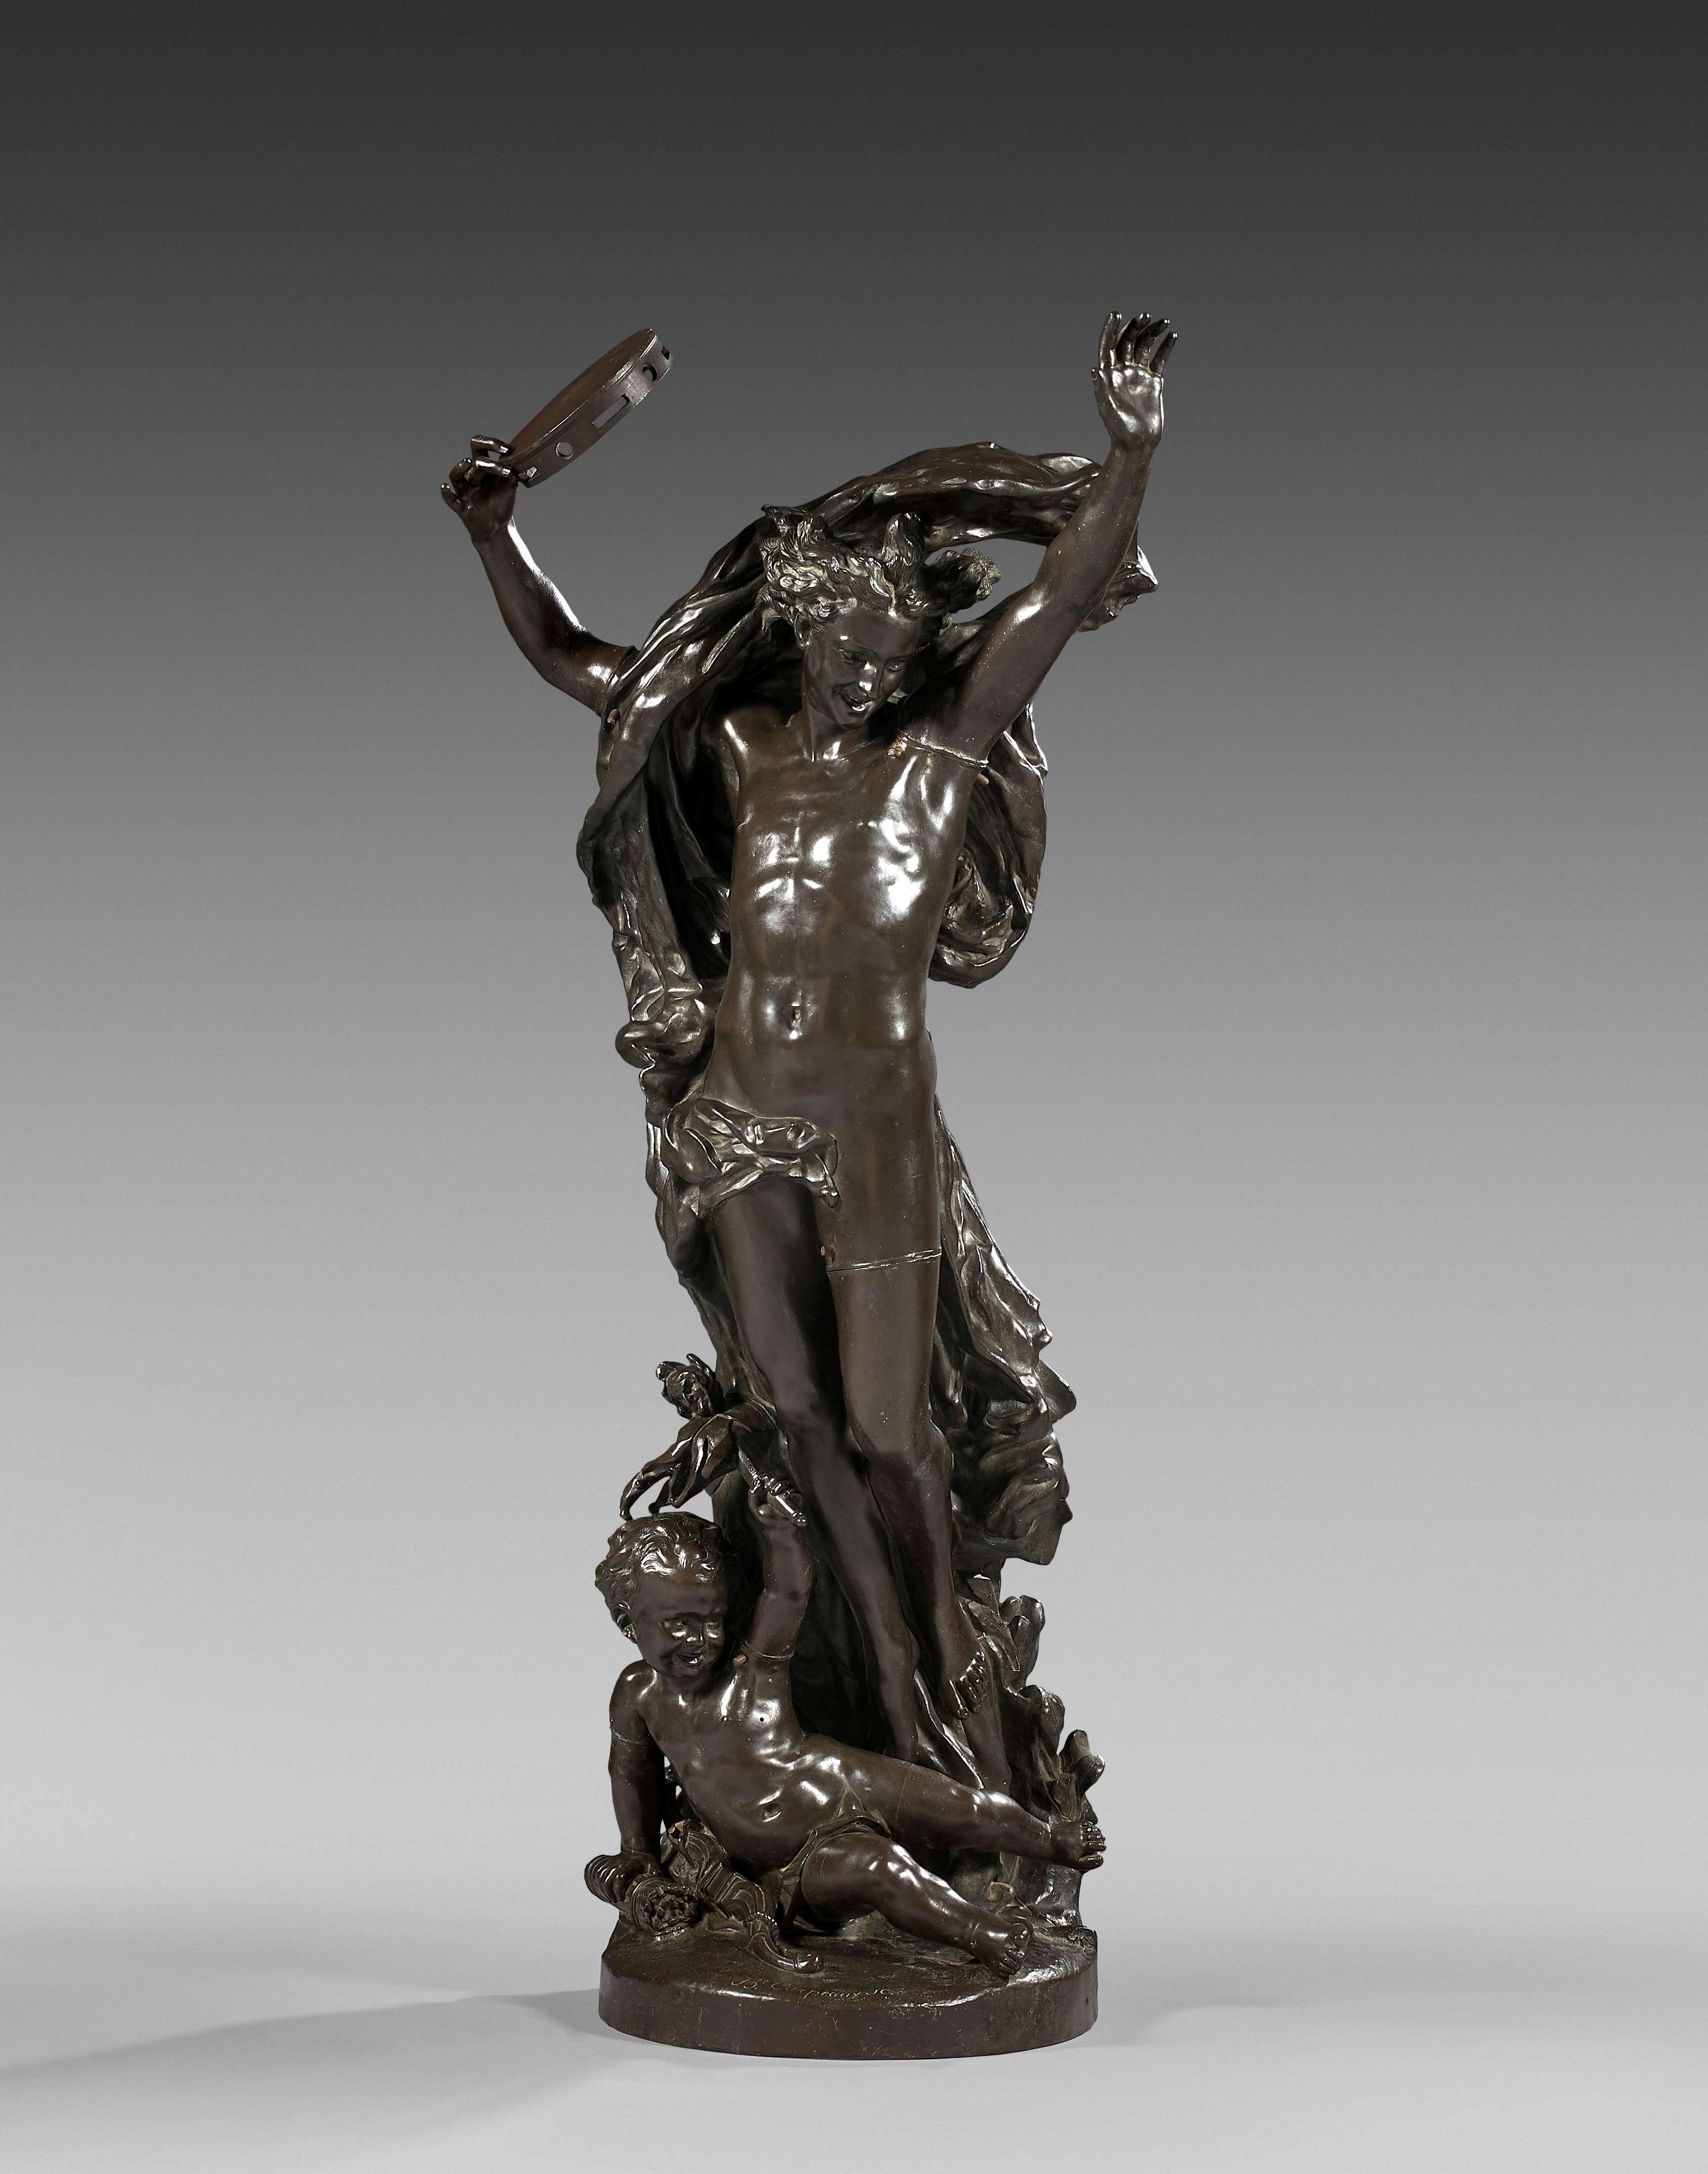 J B Carpeaux, 'The Genius of the Dance', bronze. Photo: Artcurial